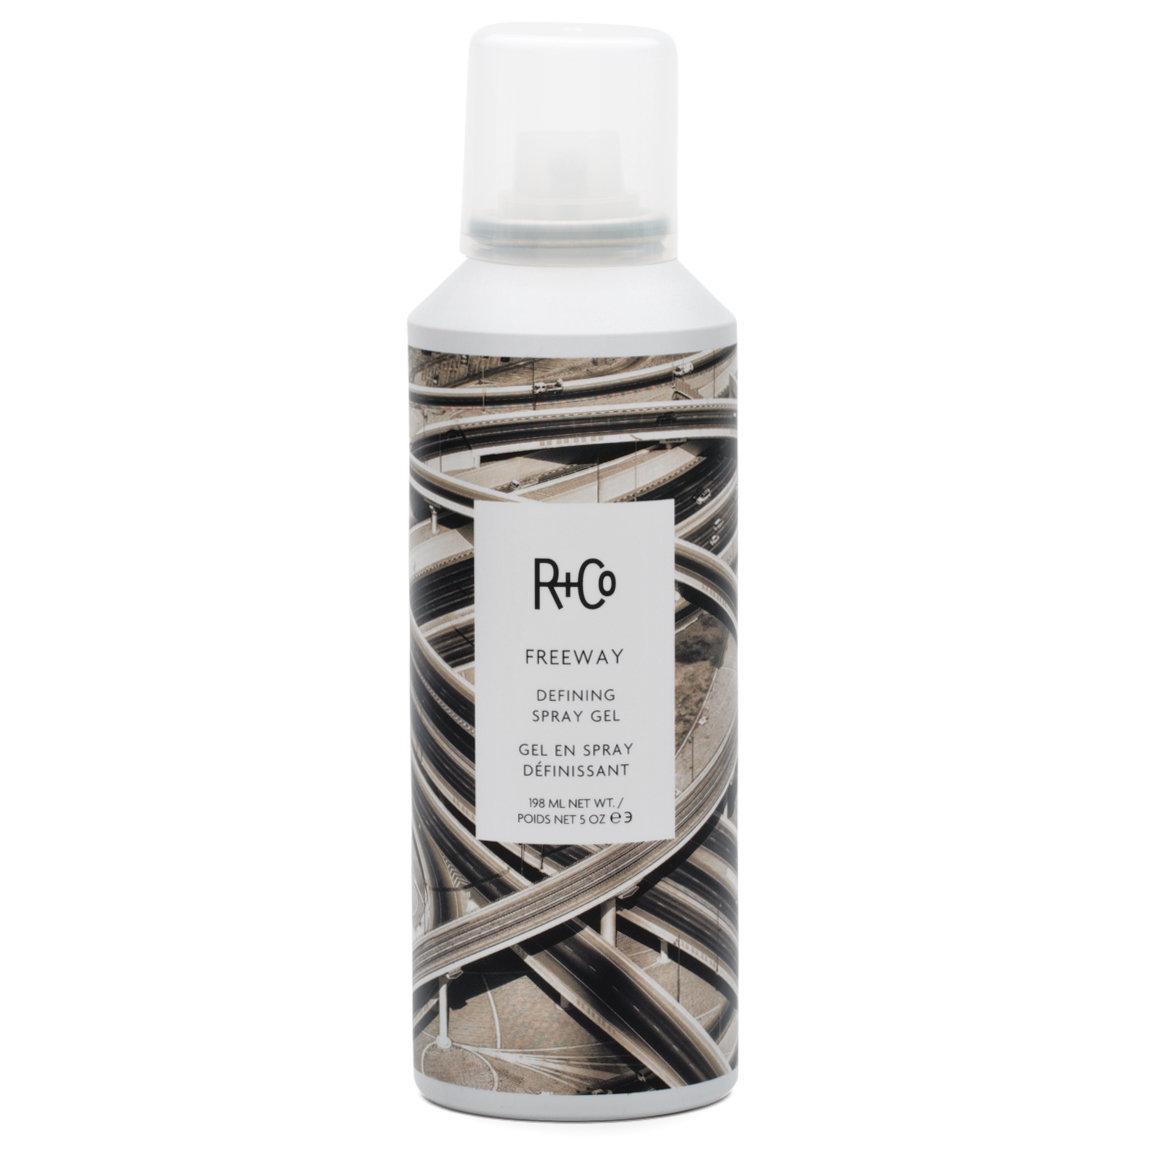 R+Co Freeway Defining Spray alternative view 1 - product swatch.